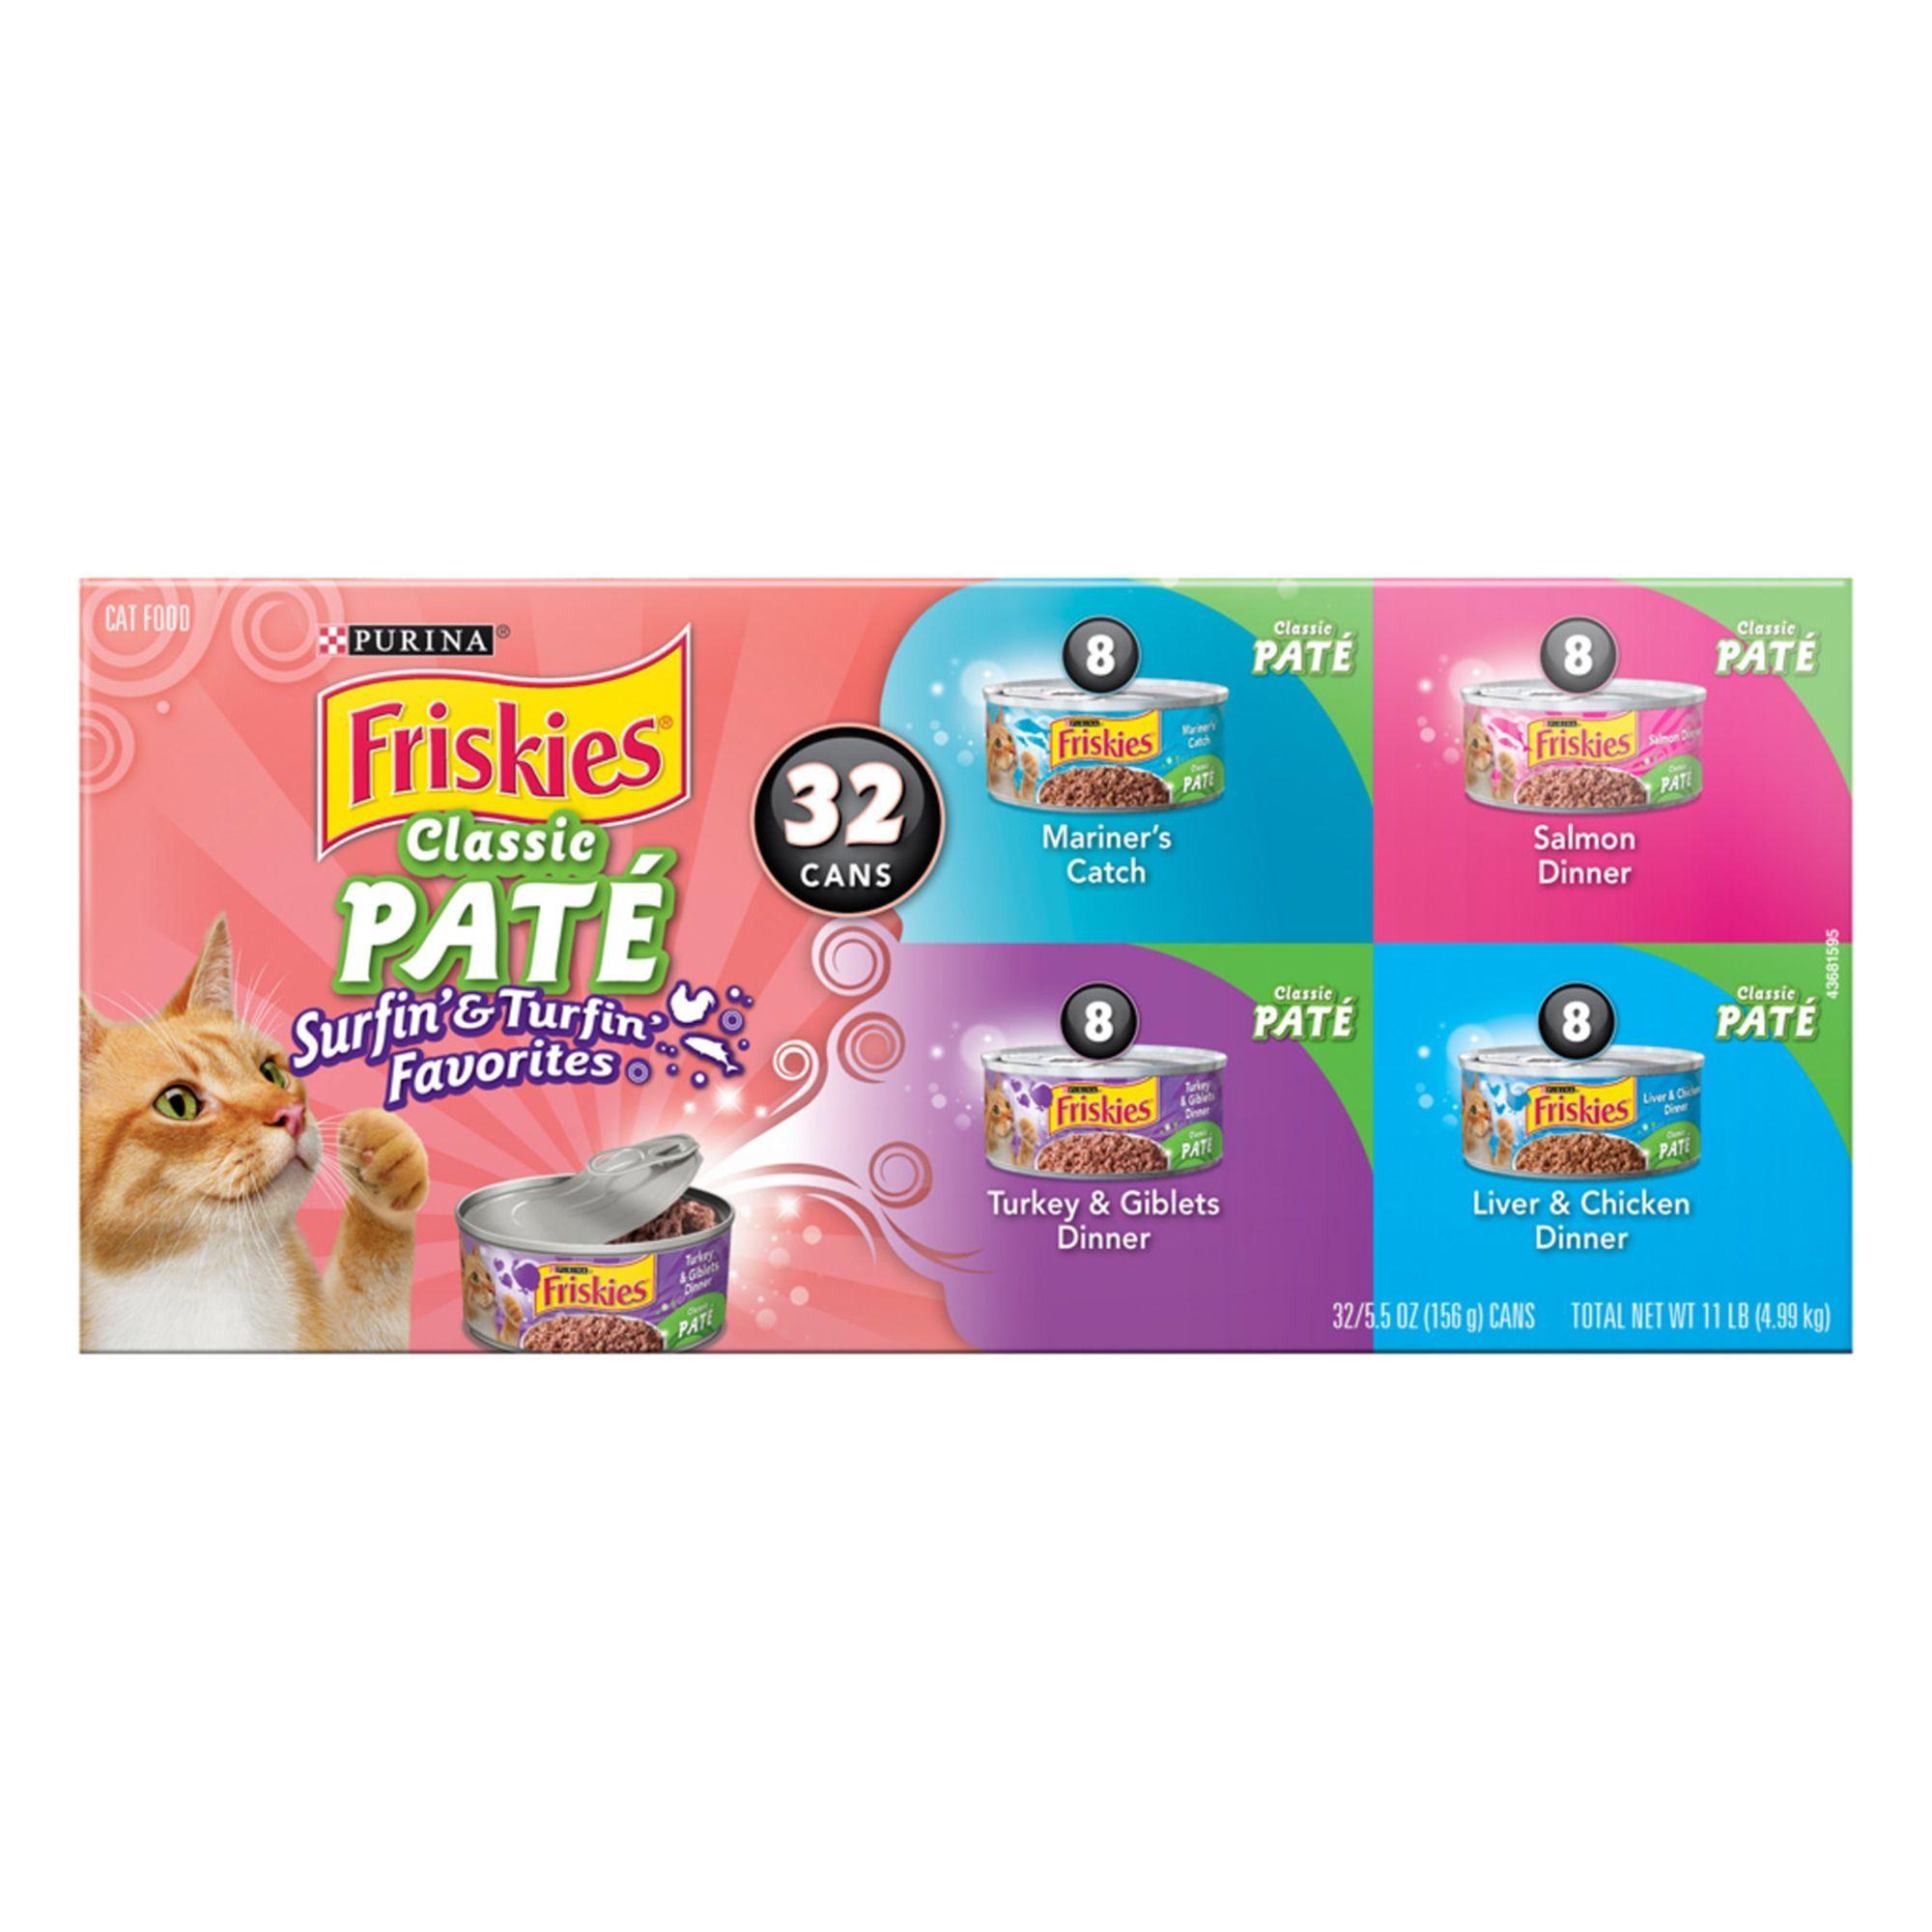 Purina® Friskies® Classic Pate Cat Food Surfin' & Turfin